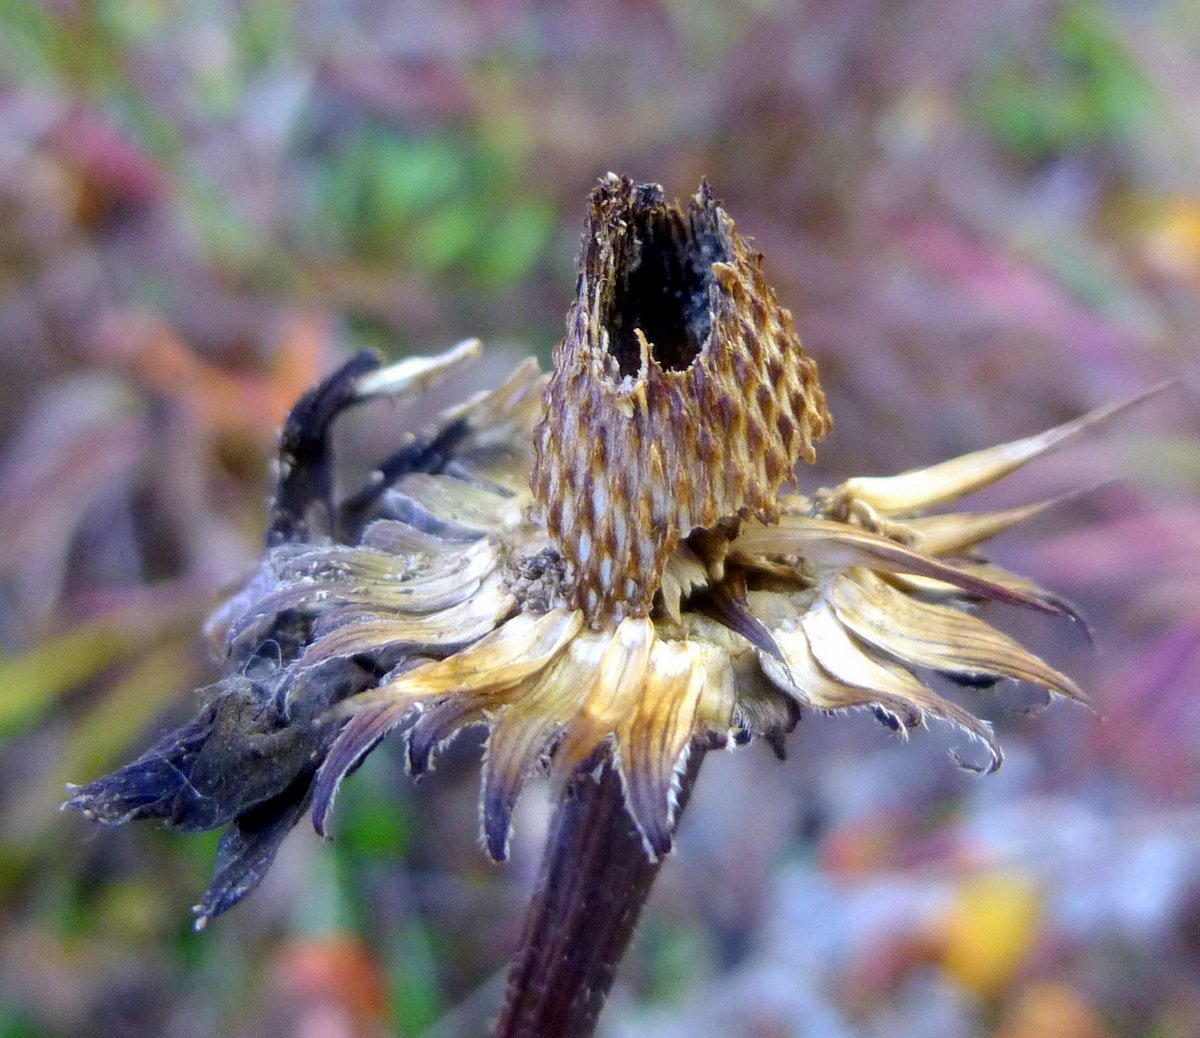 1. Coneflower Seed Head